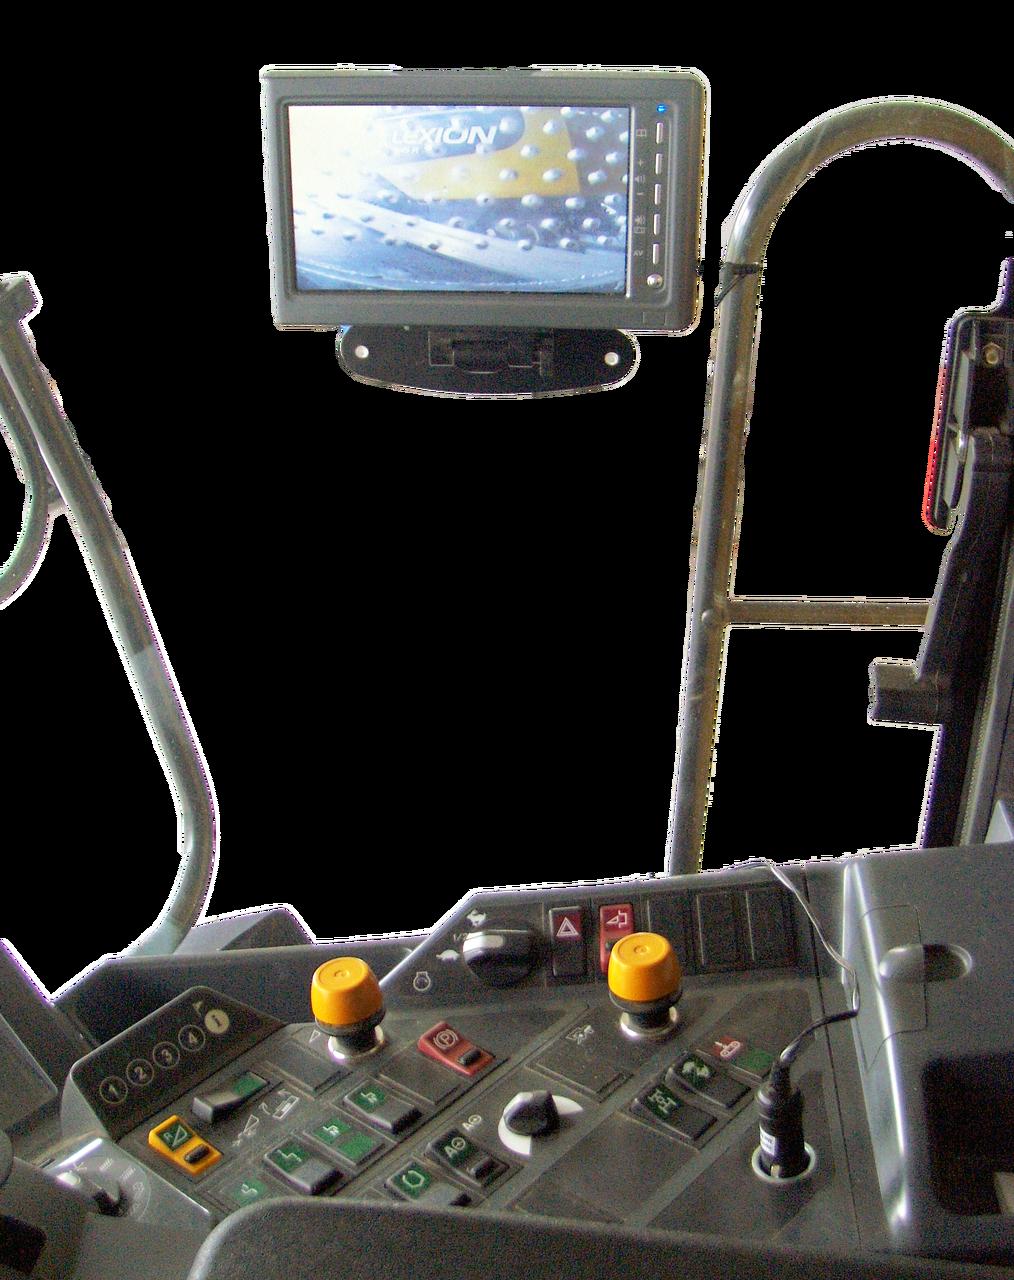 Grain Harvester Unloading Camera IN-CAB monitor